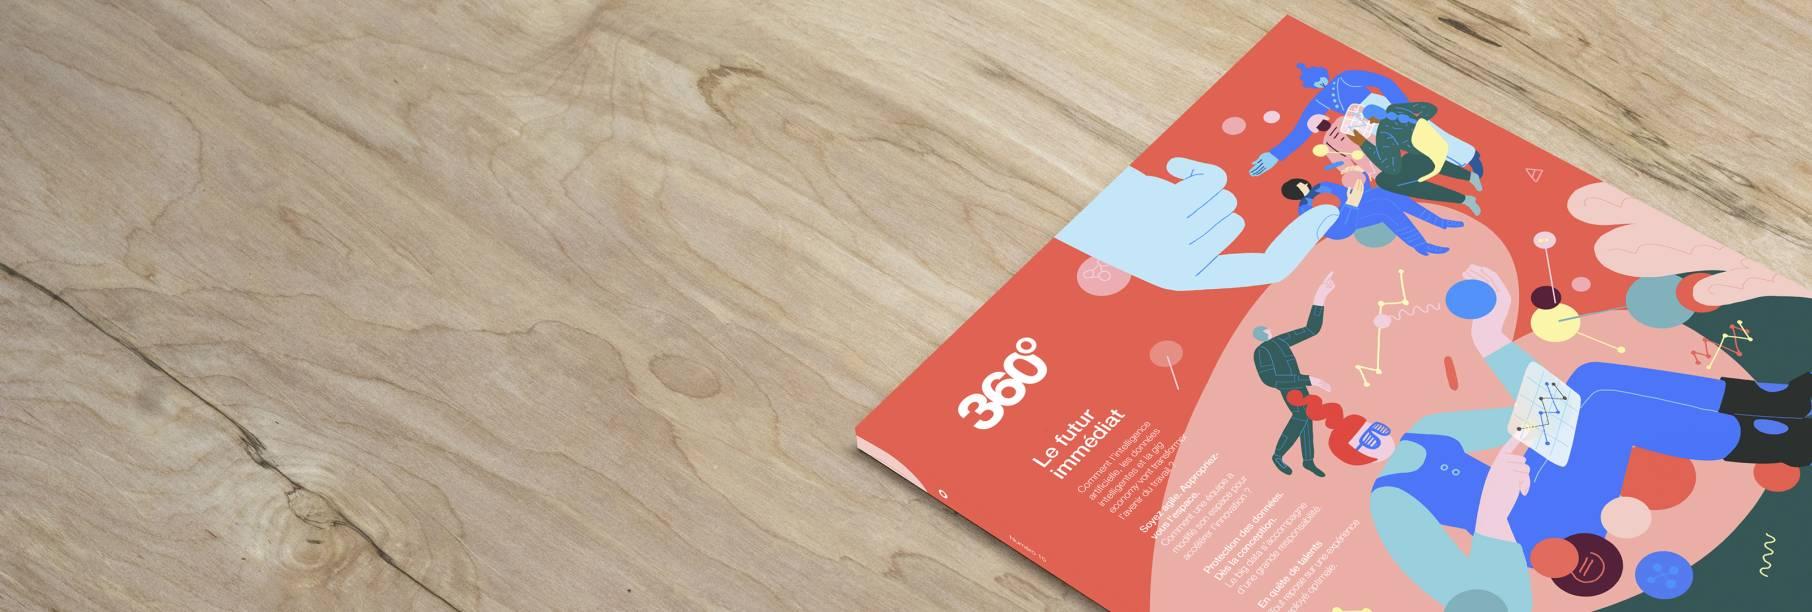 Magazine360_Steelcase